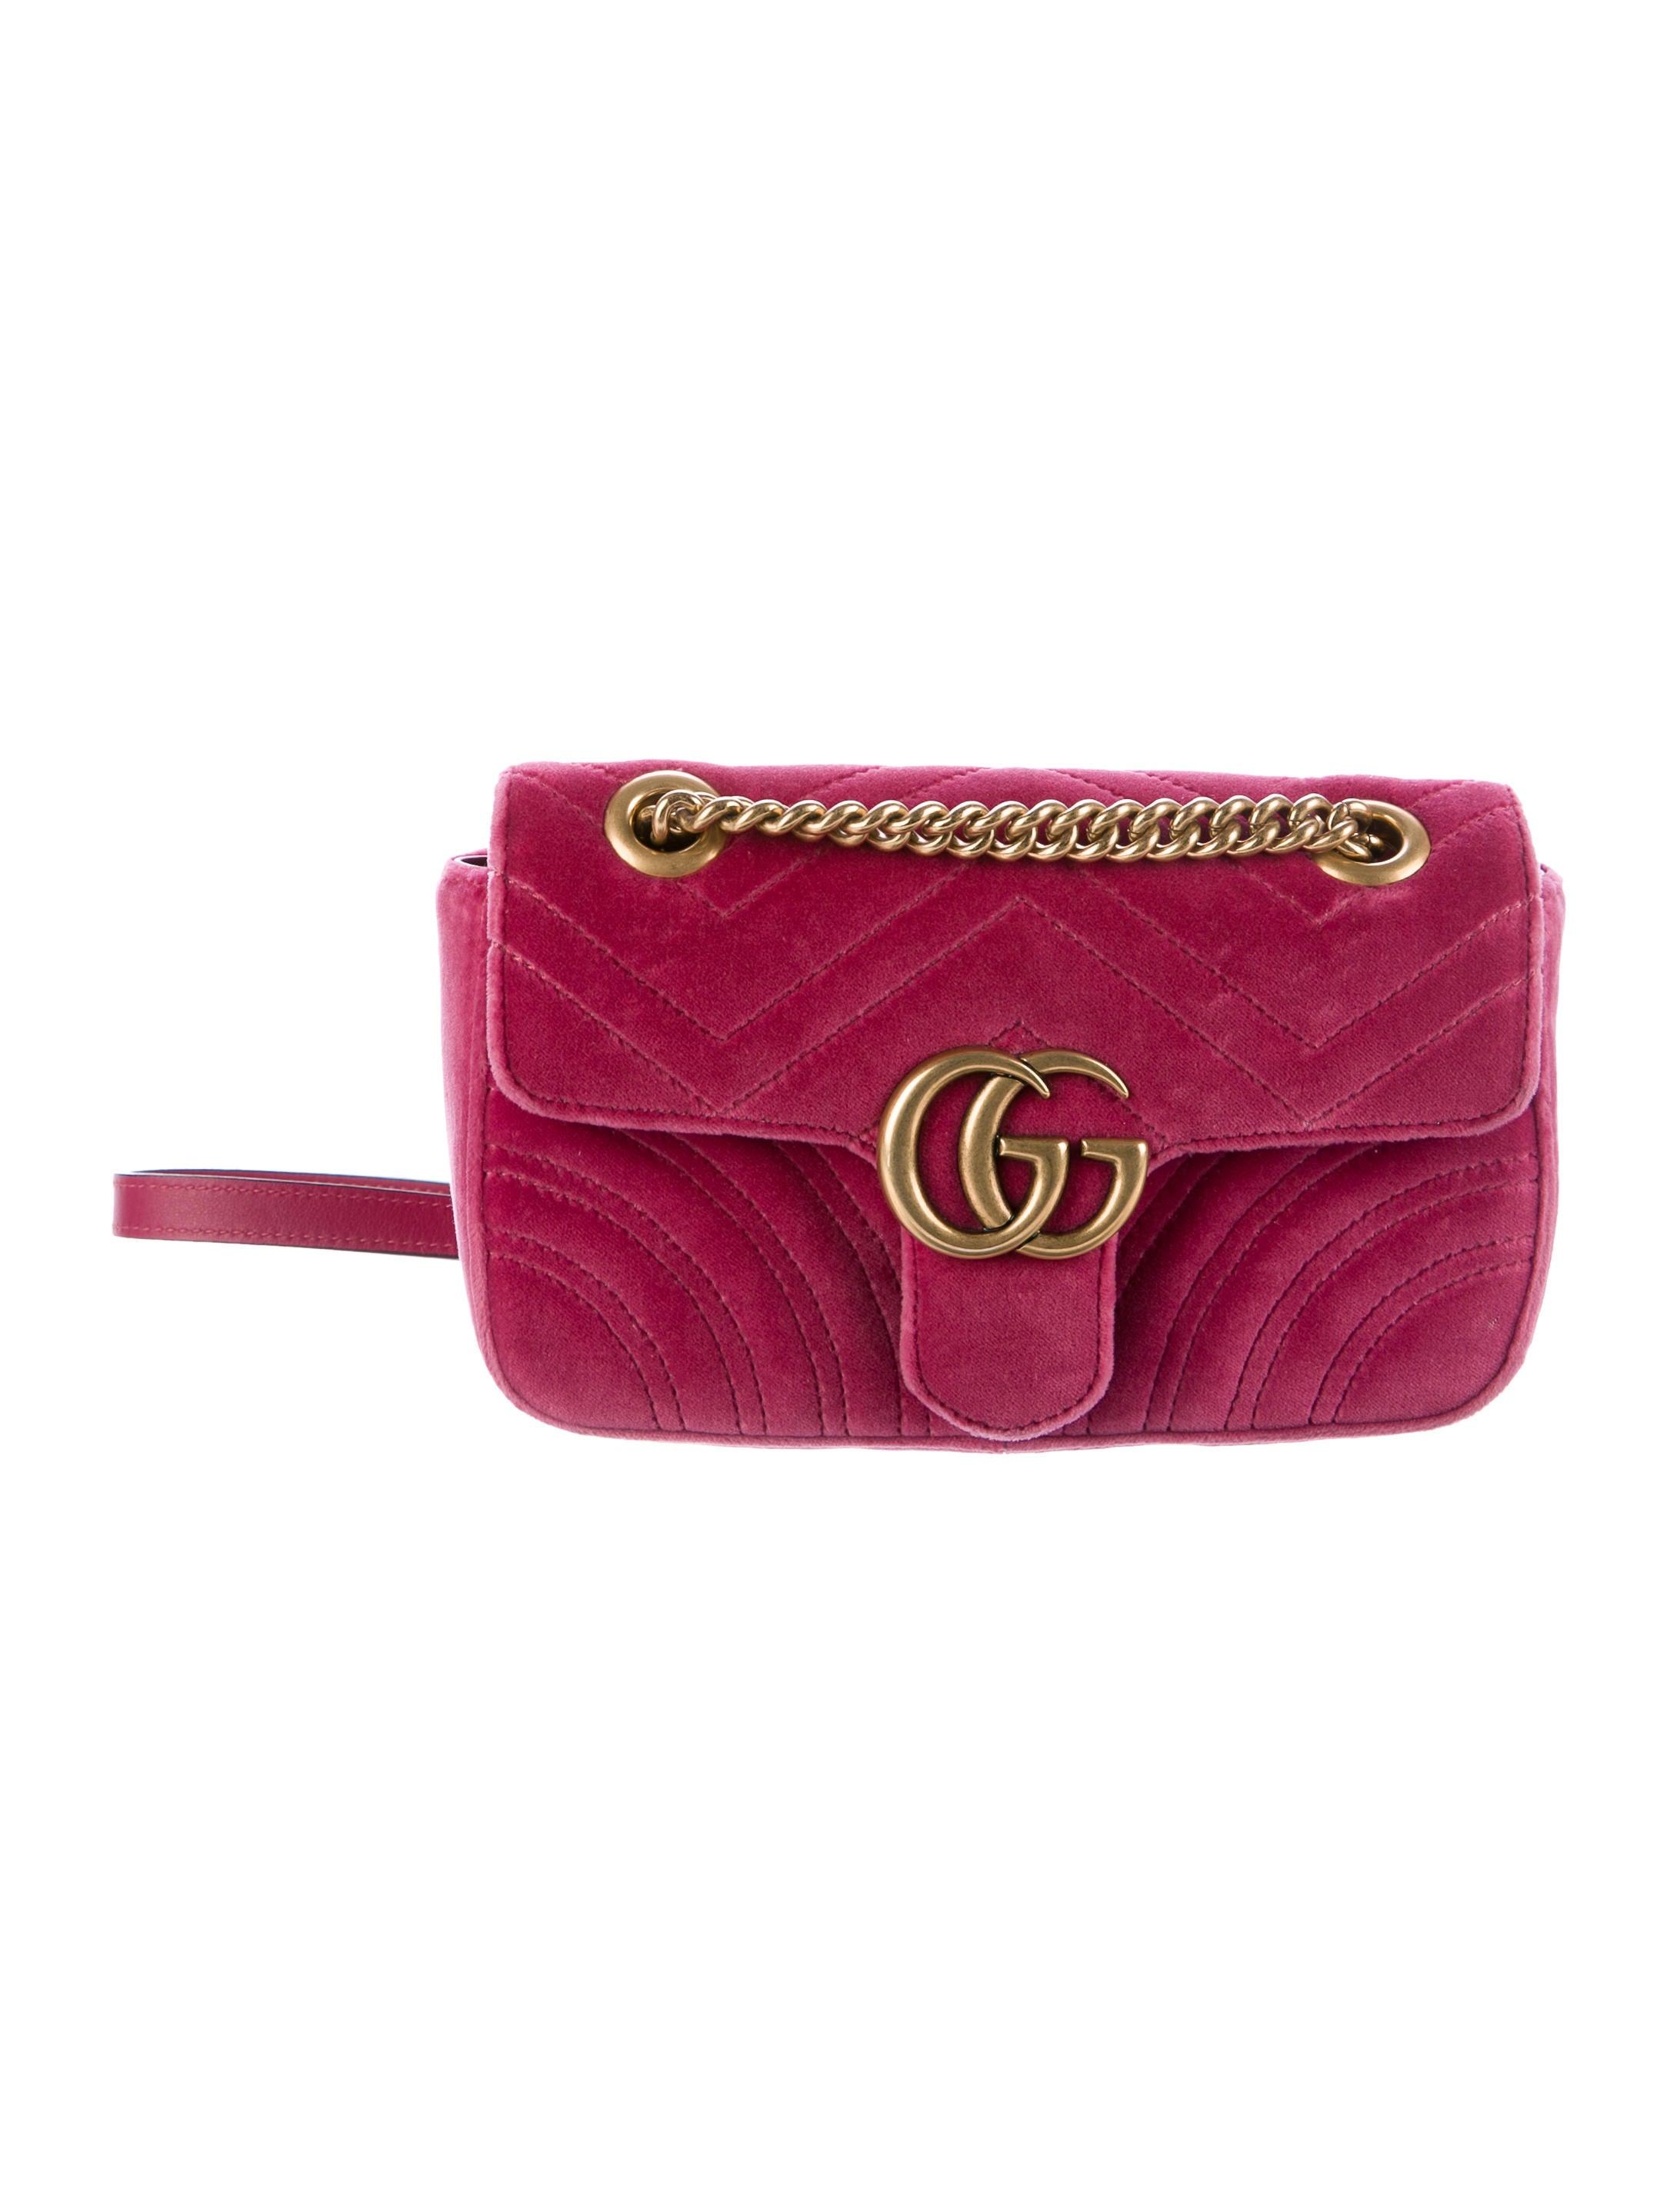 9cb223b64466 Gucci 2017 GG Marmont Velvet Mini Bag - Handbags - GUC171295 | The ...